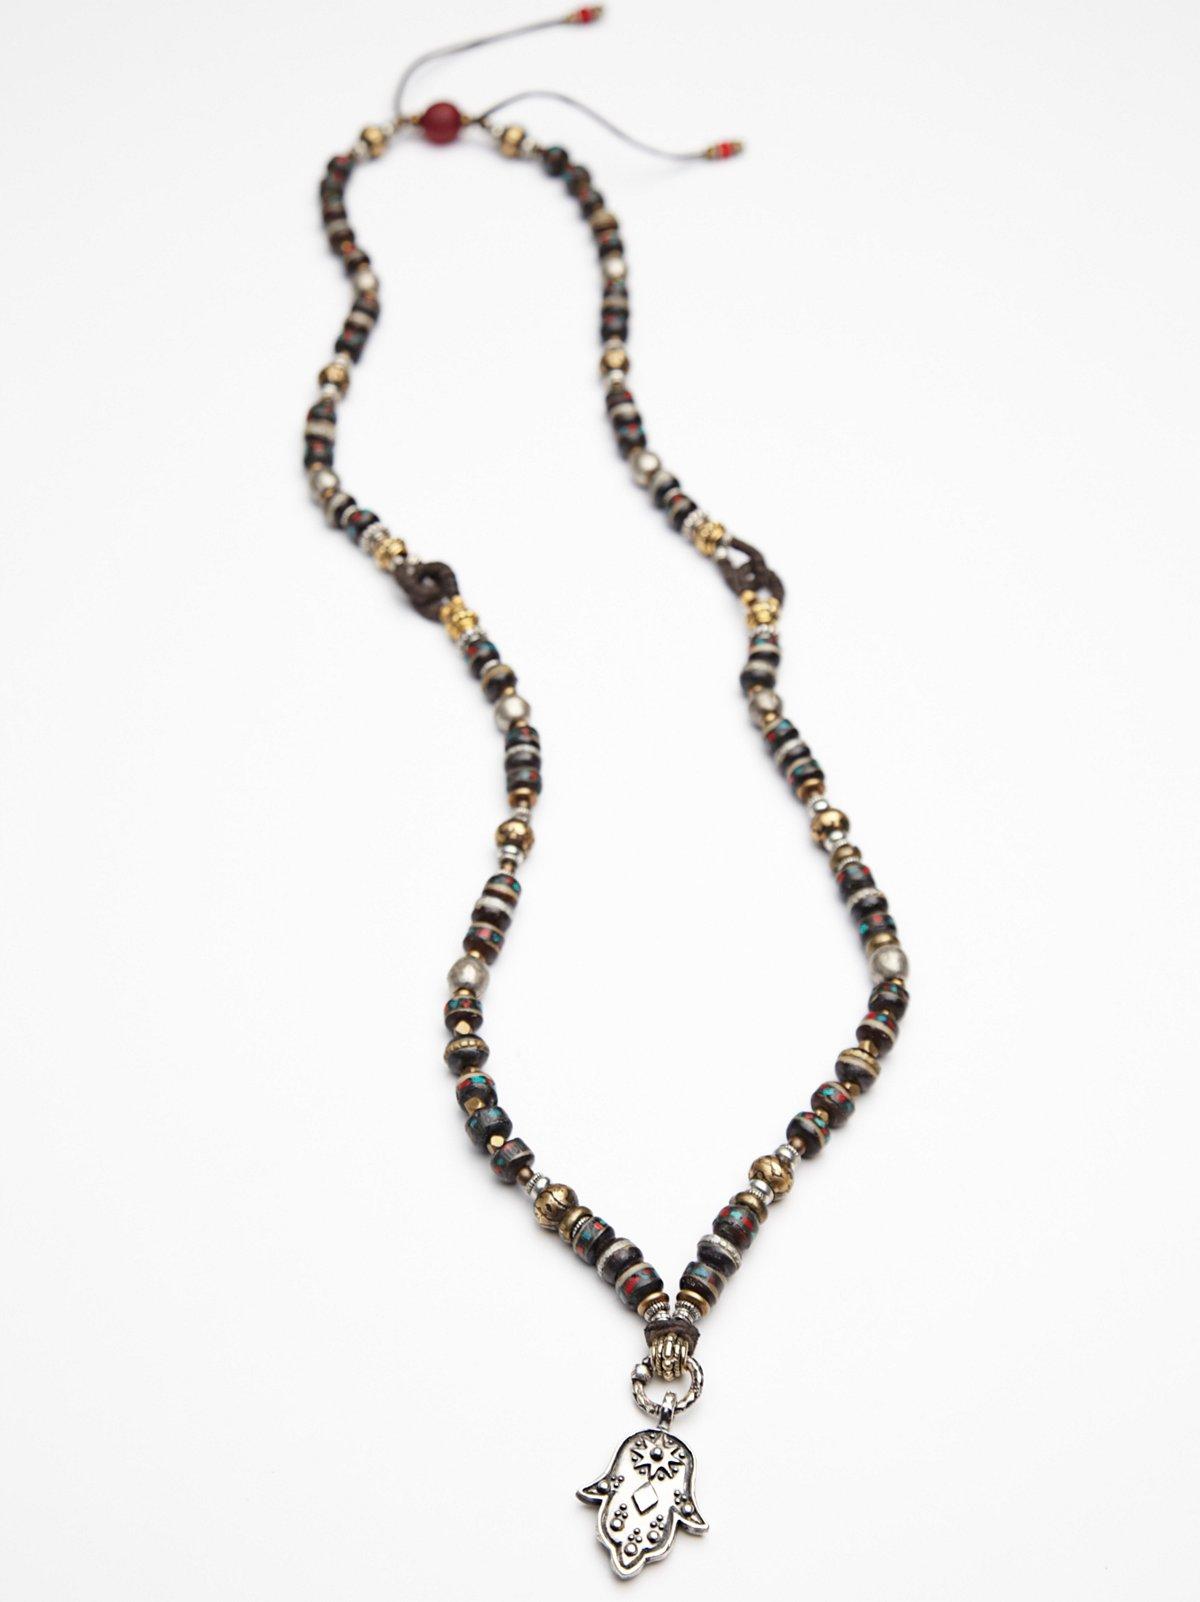 Tibetan Fiesta Hamsa Necklace